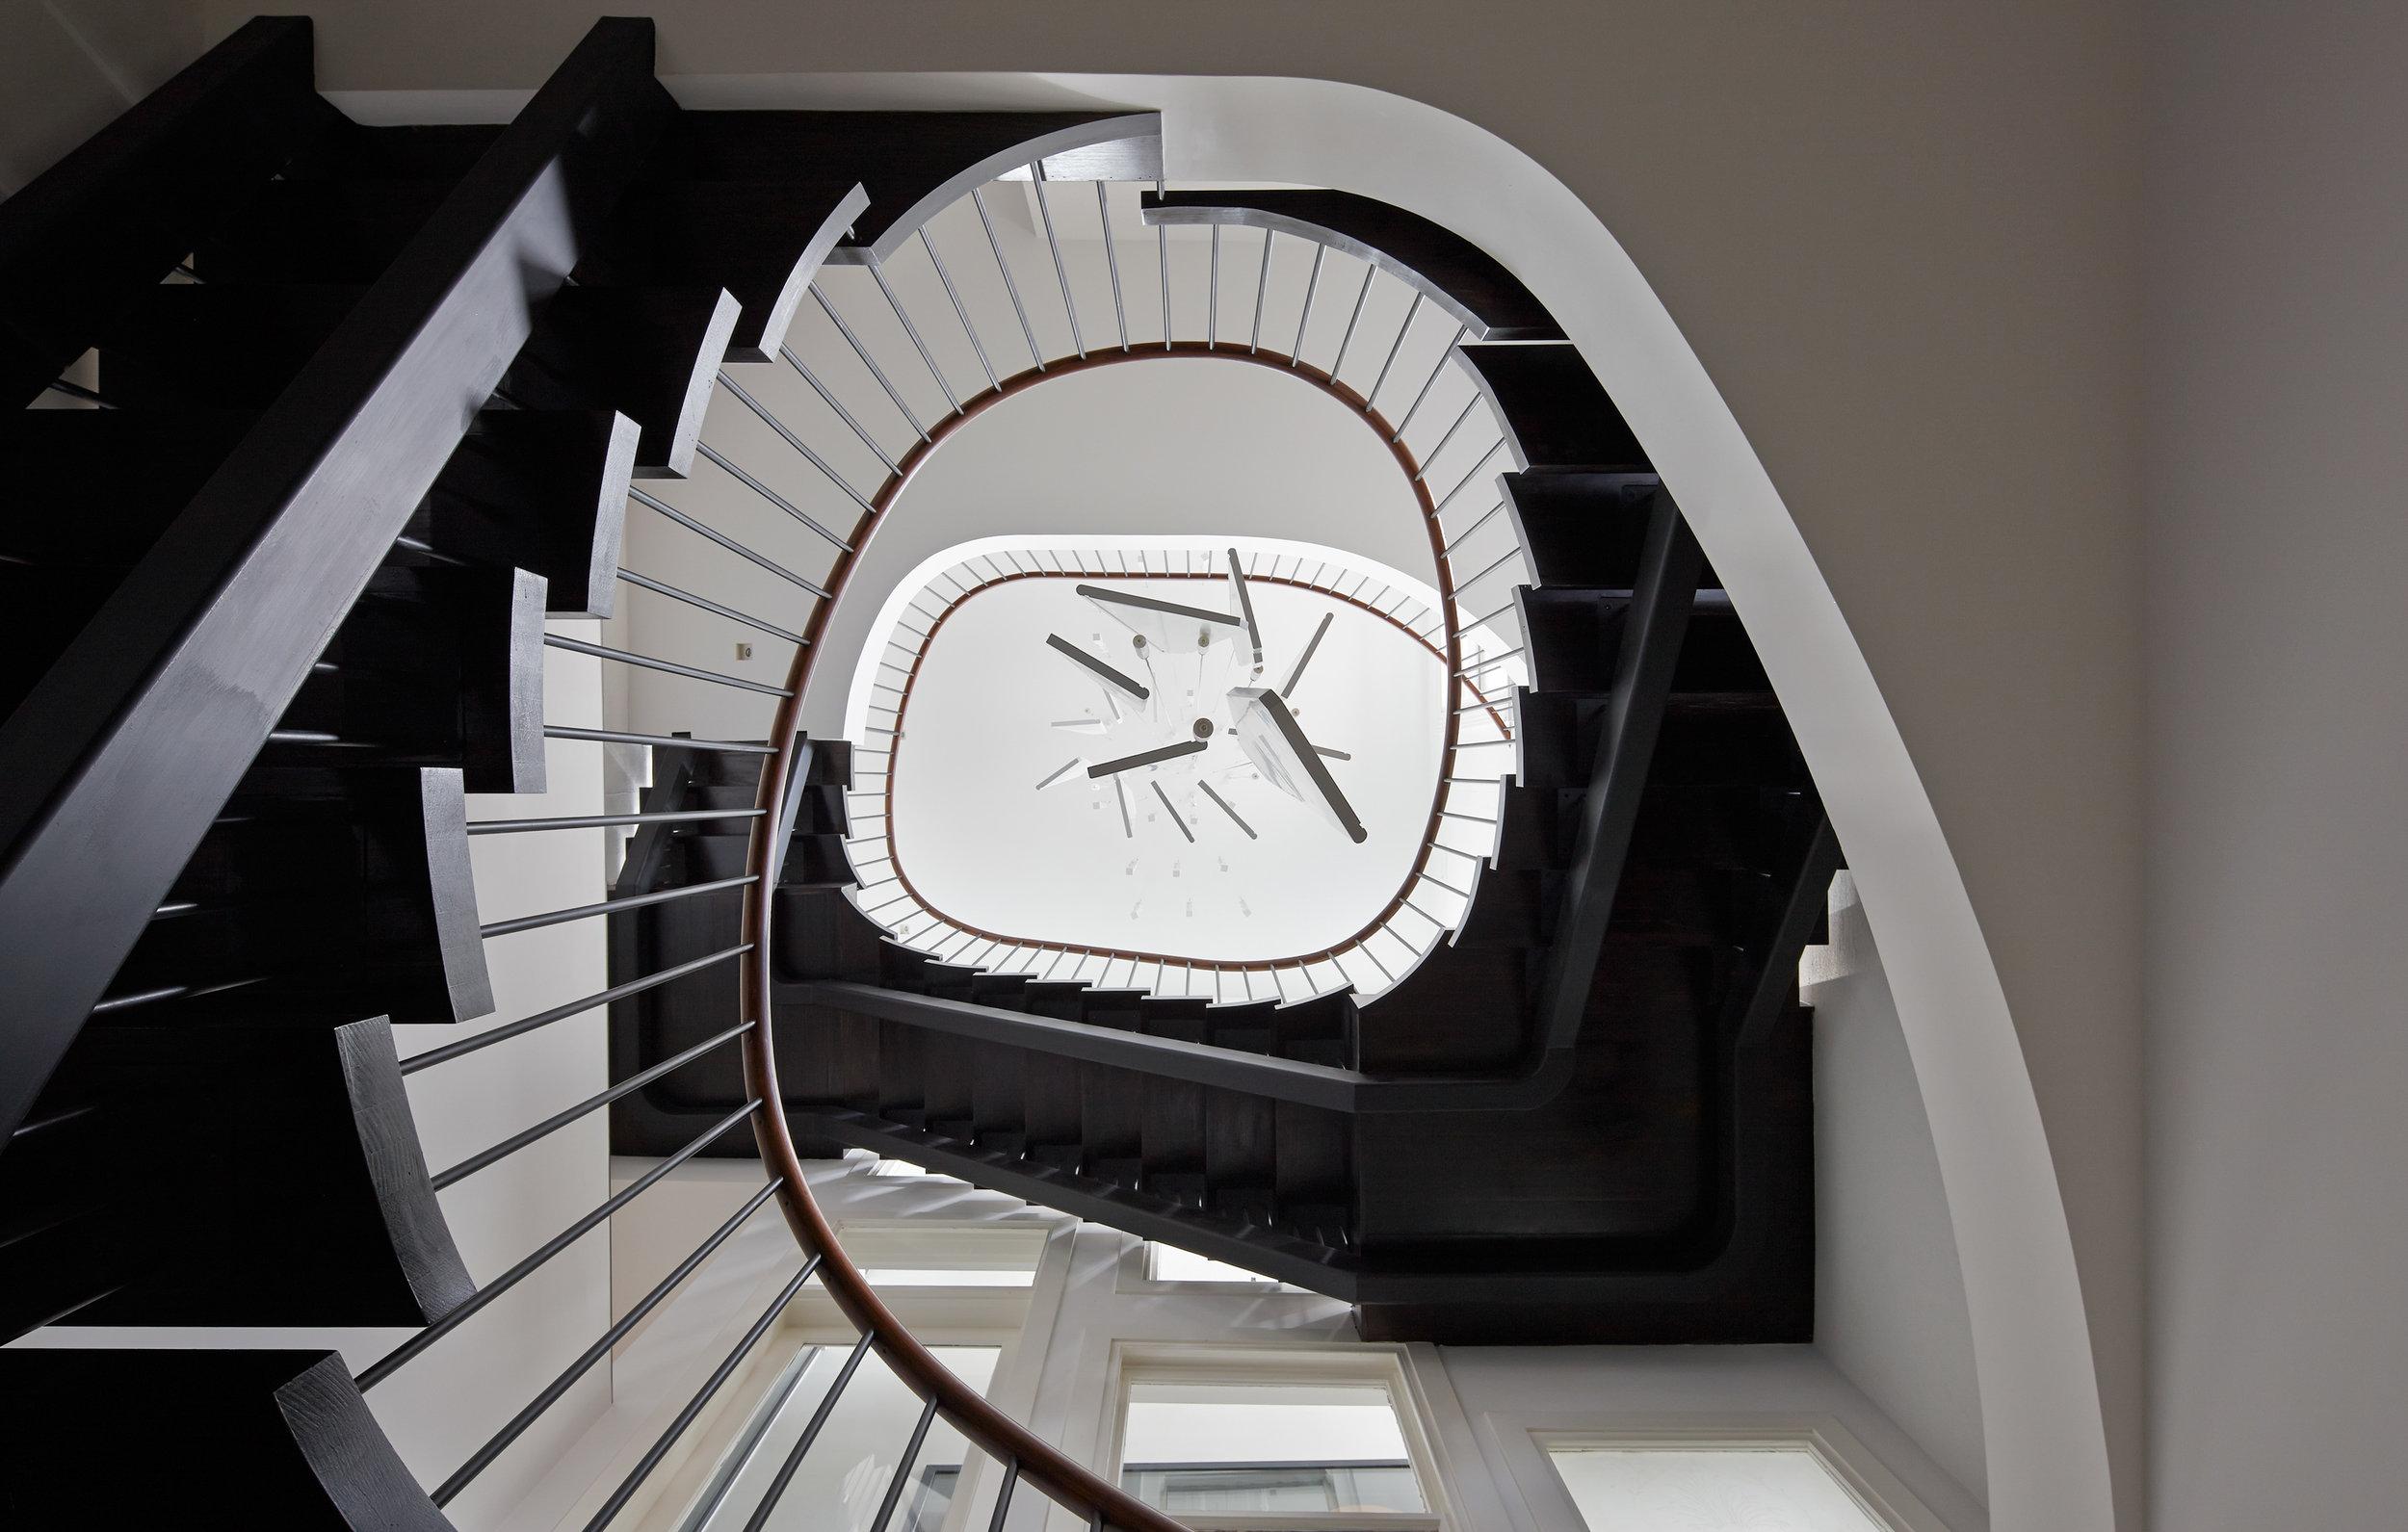 cubo-house-phooey-architects-the-design-emotive-34.jpg